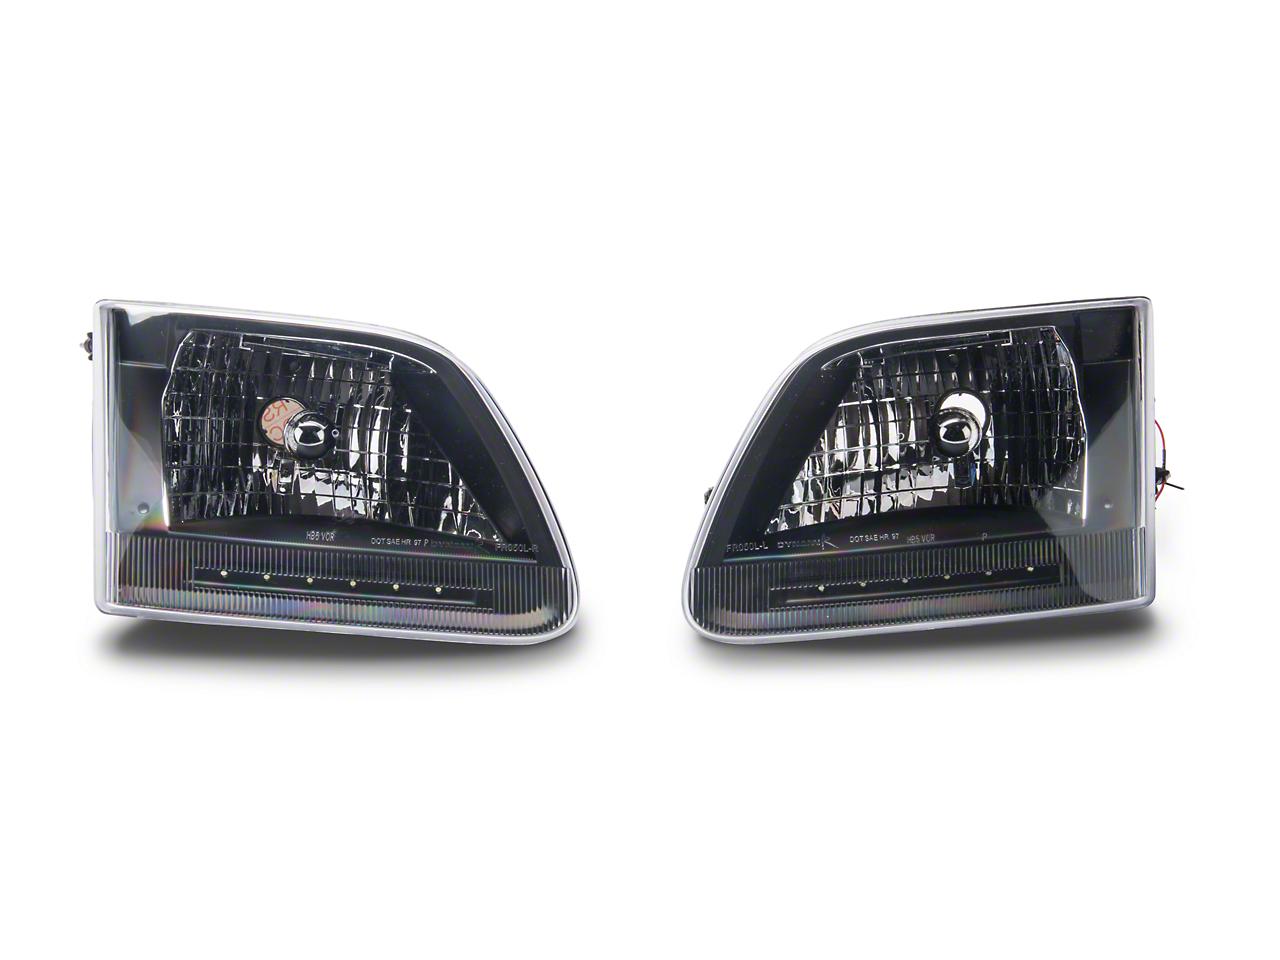 Axial Black LED Crystal Headlights (97-03 All)